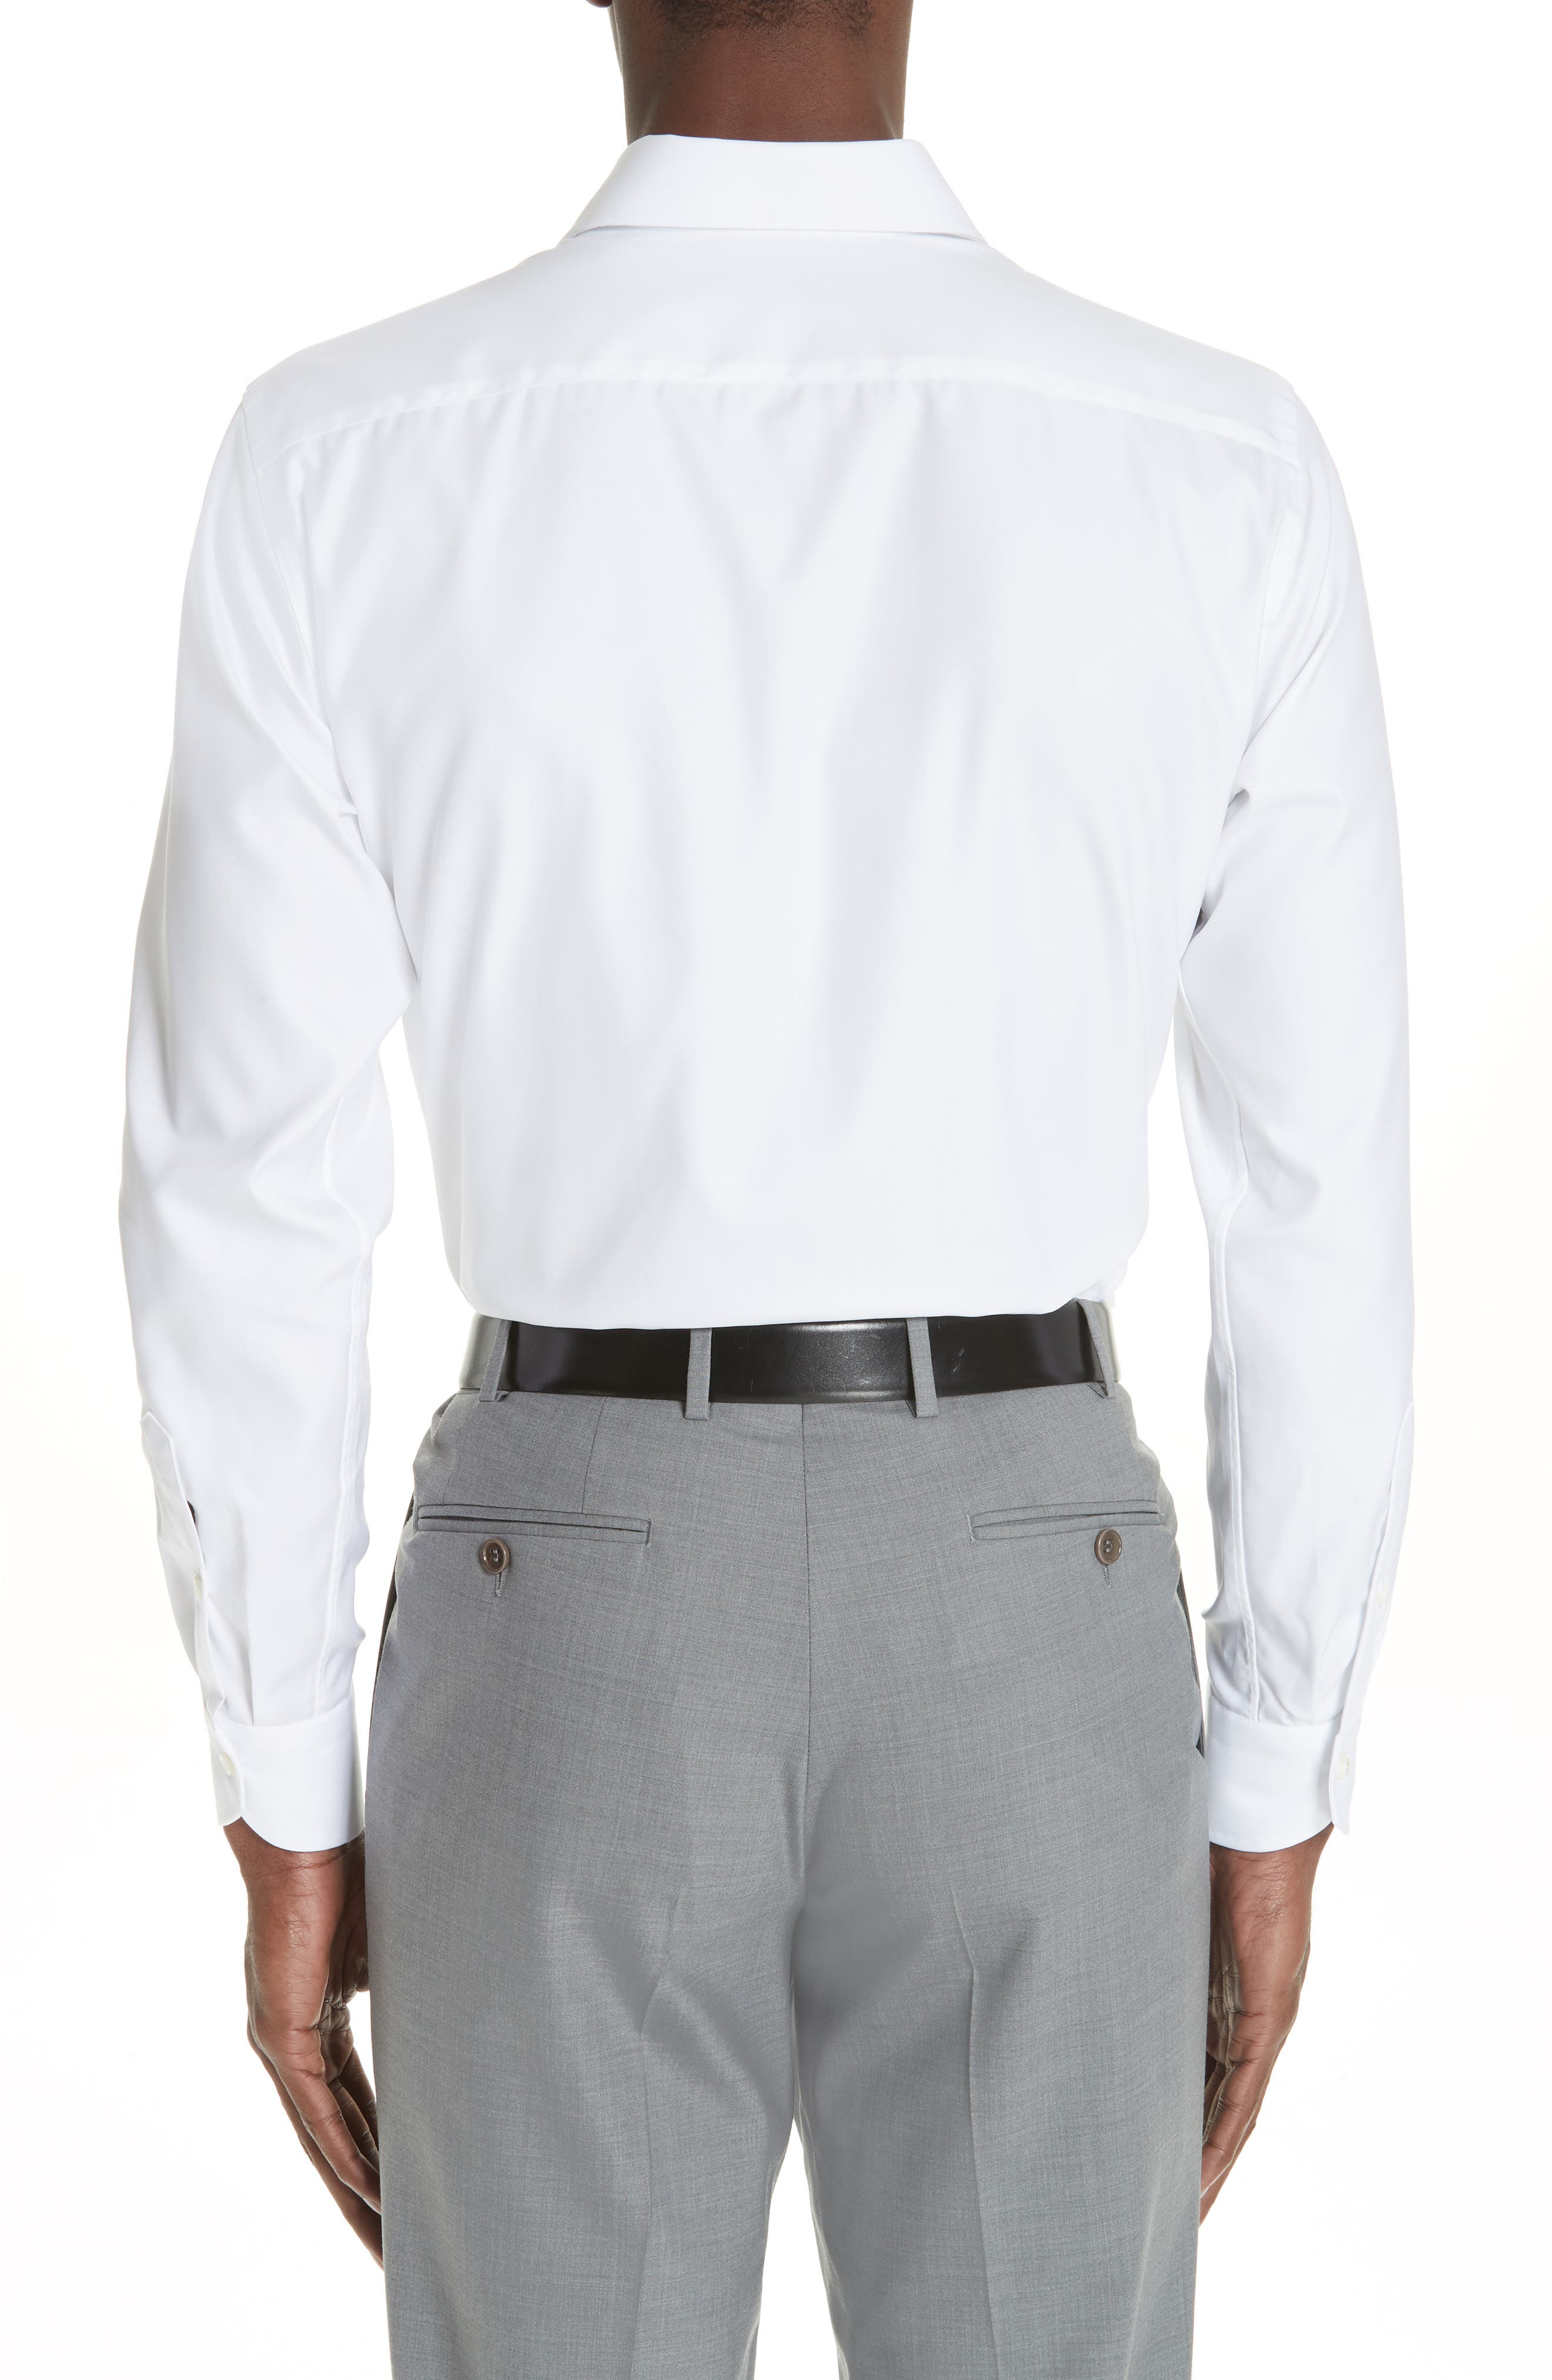 Regular Fit Solid Dress Shirt,                             Alternate thumbnail 3, color,                             WHITE